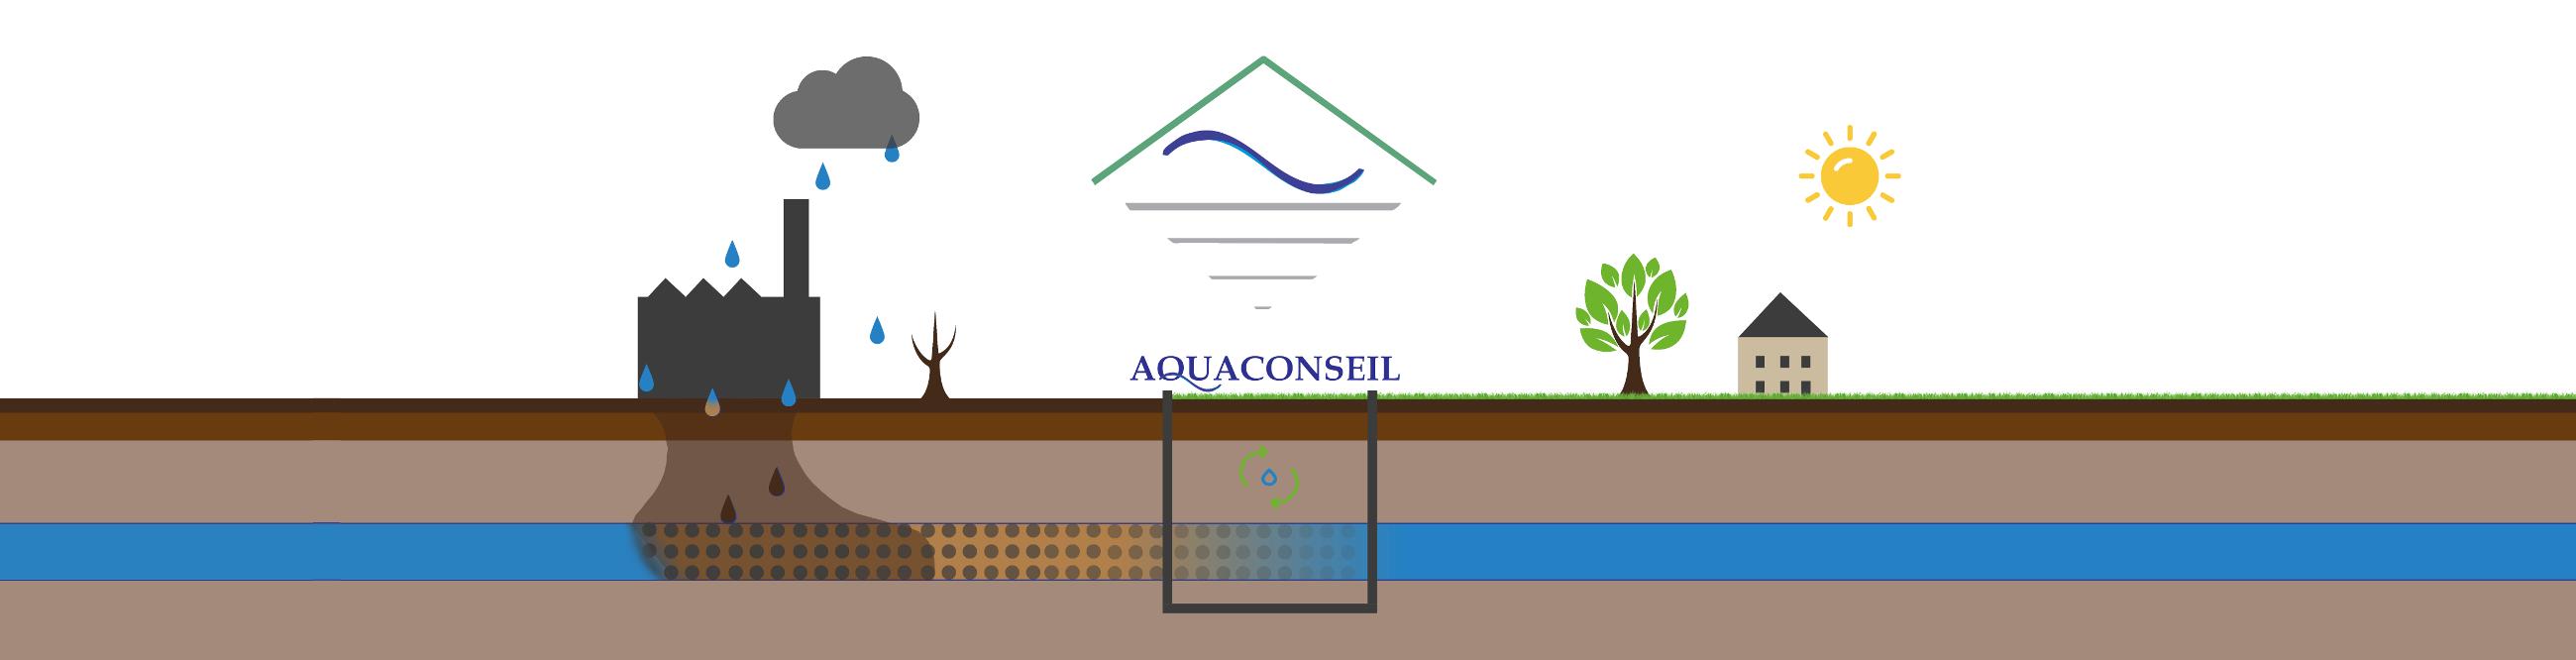 bureau etude aquaconseil